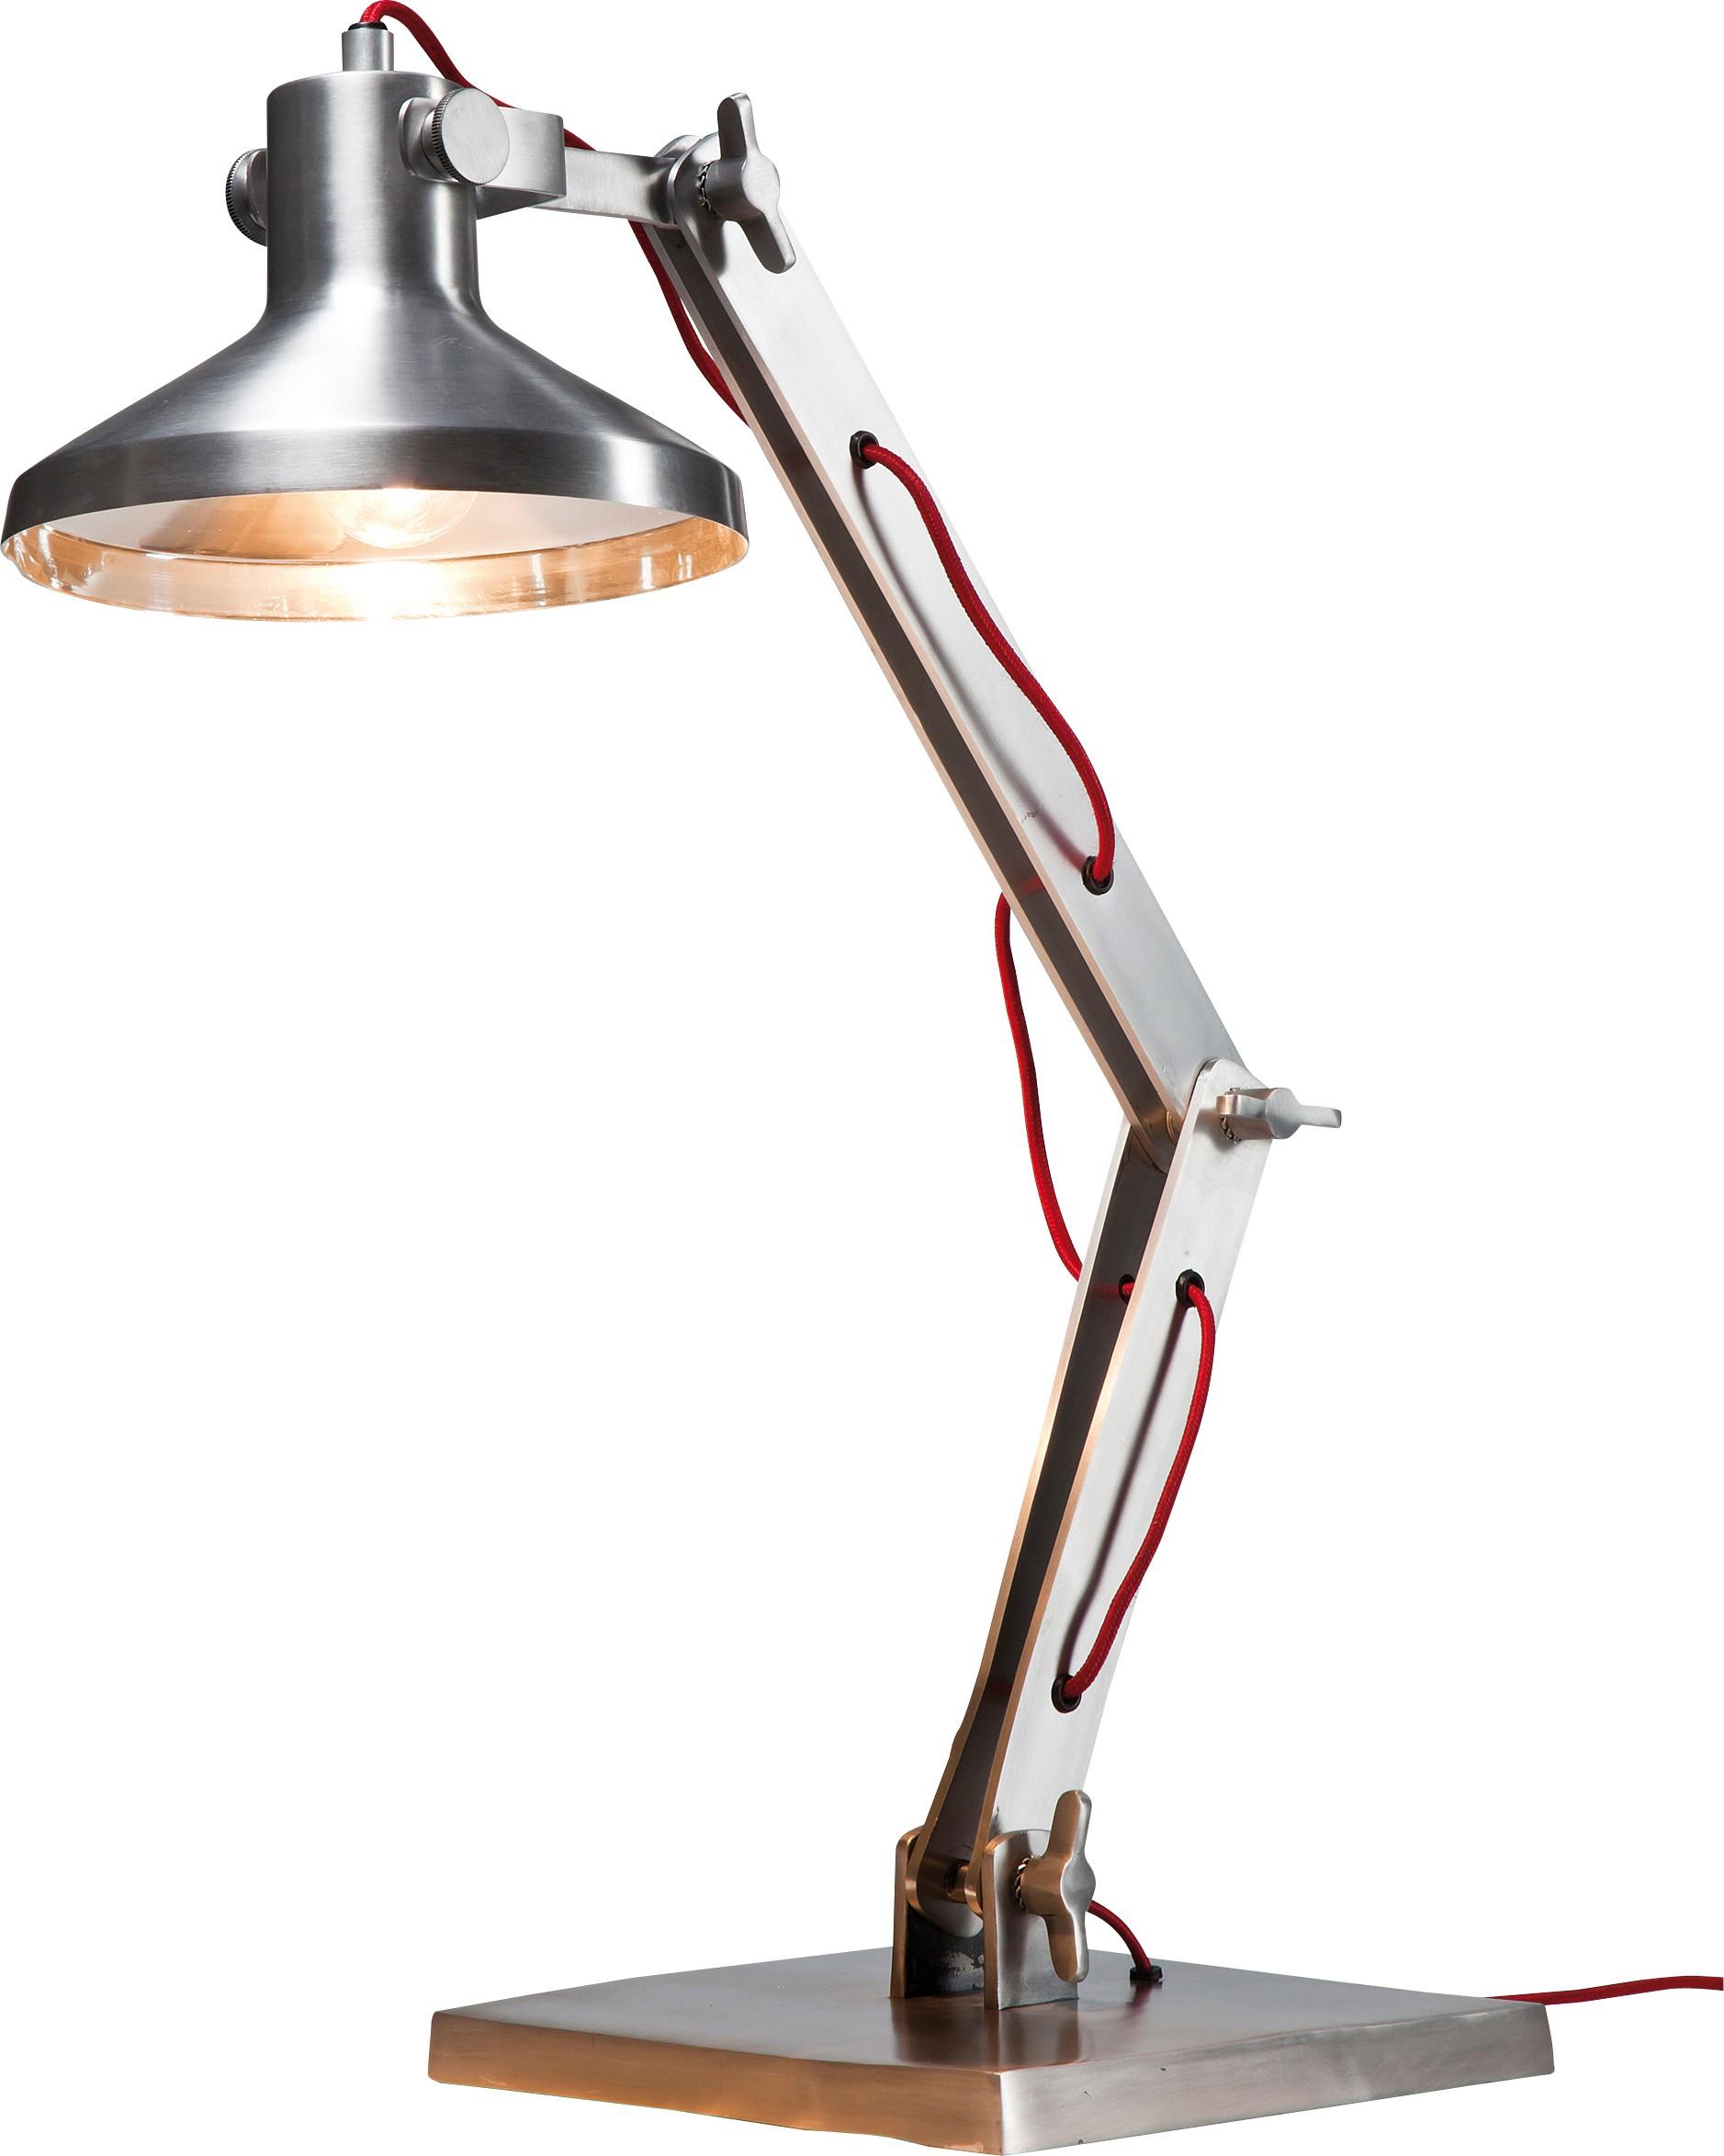 luminaire lampe de table kare design tritoo. Black Bedroom Furniture Sets. Home Design Ideas